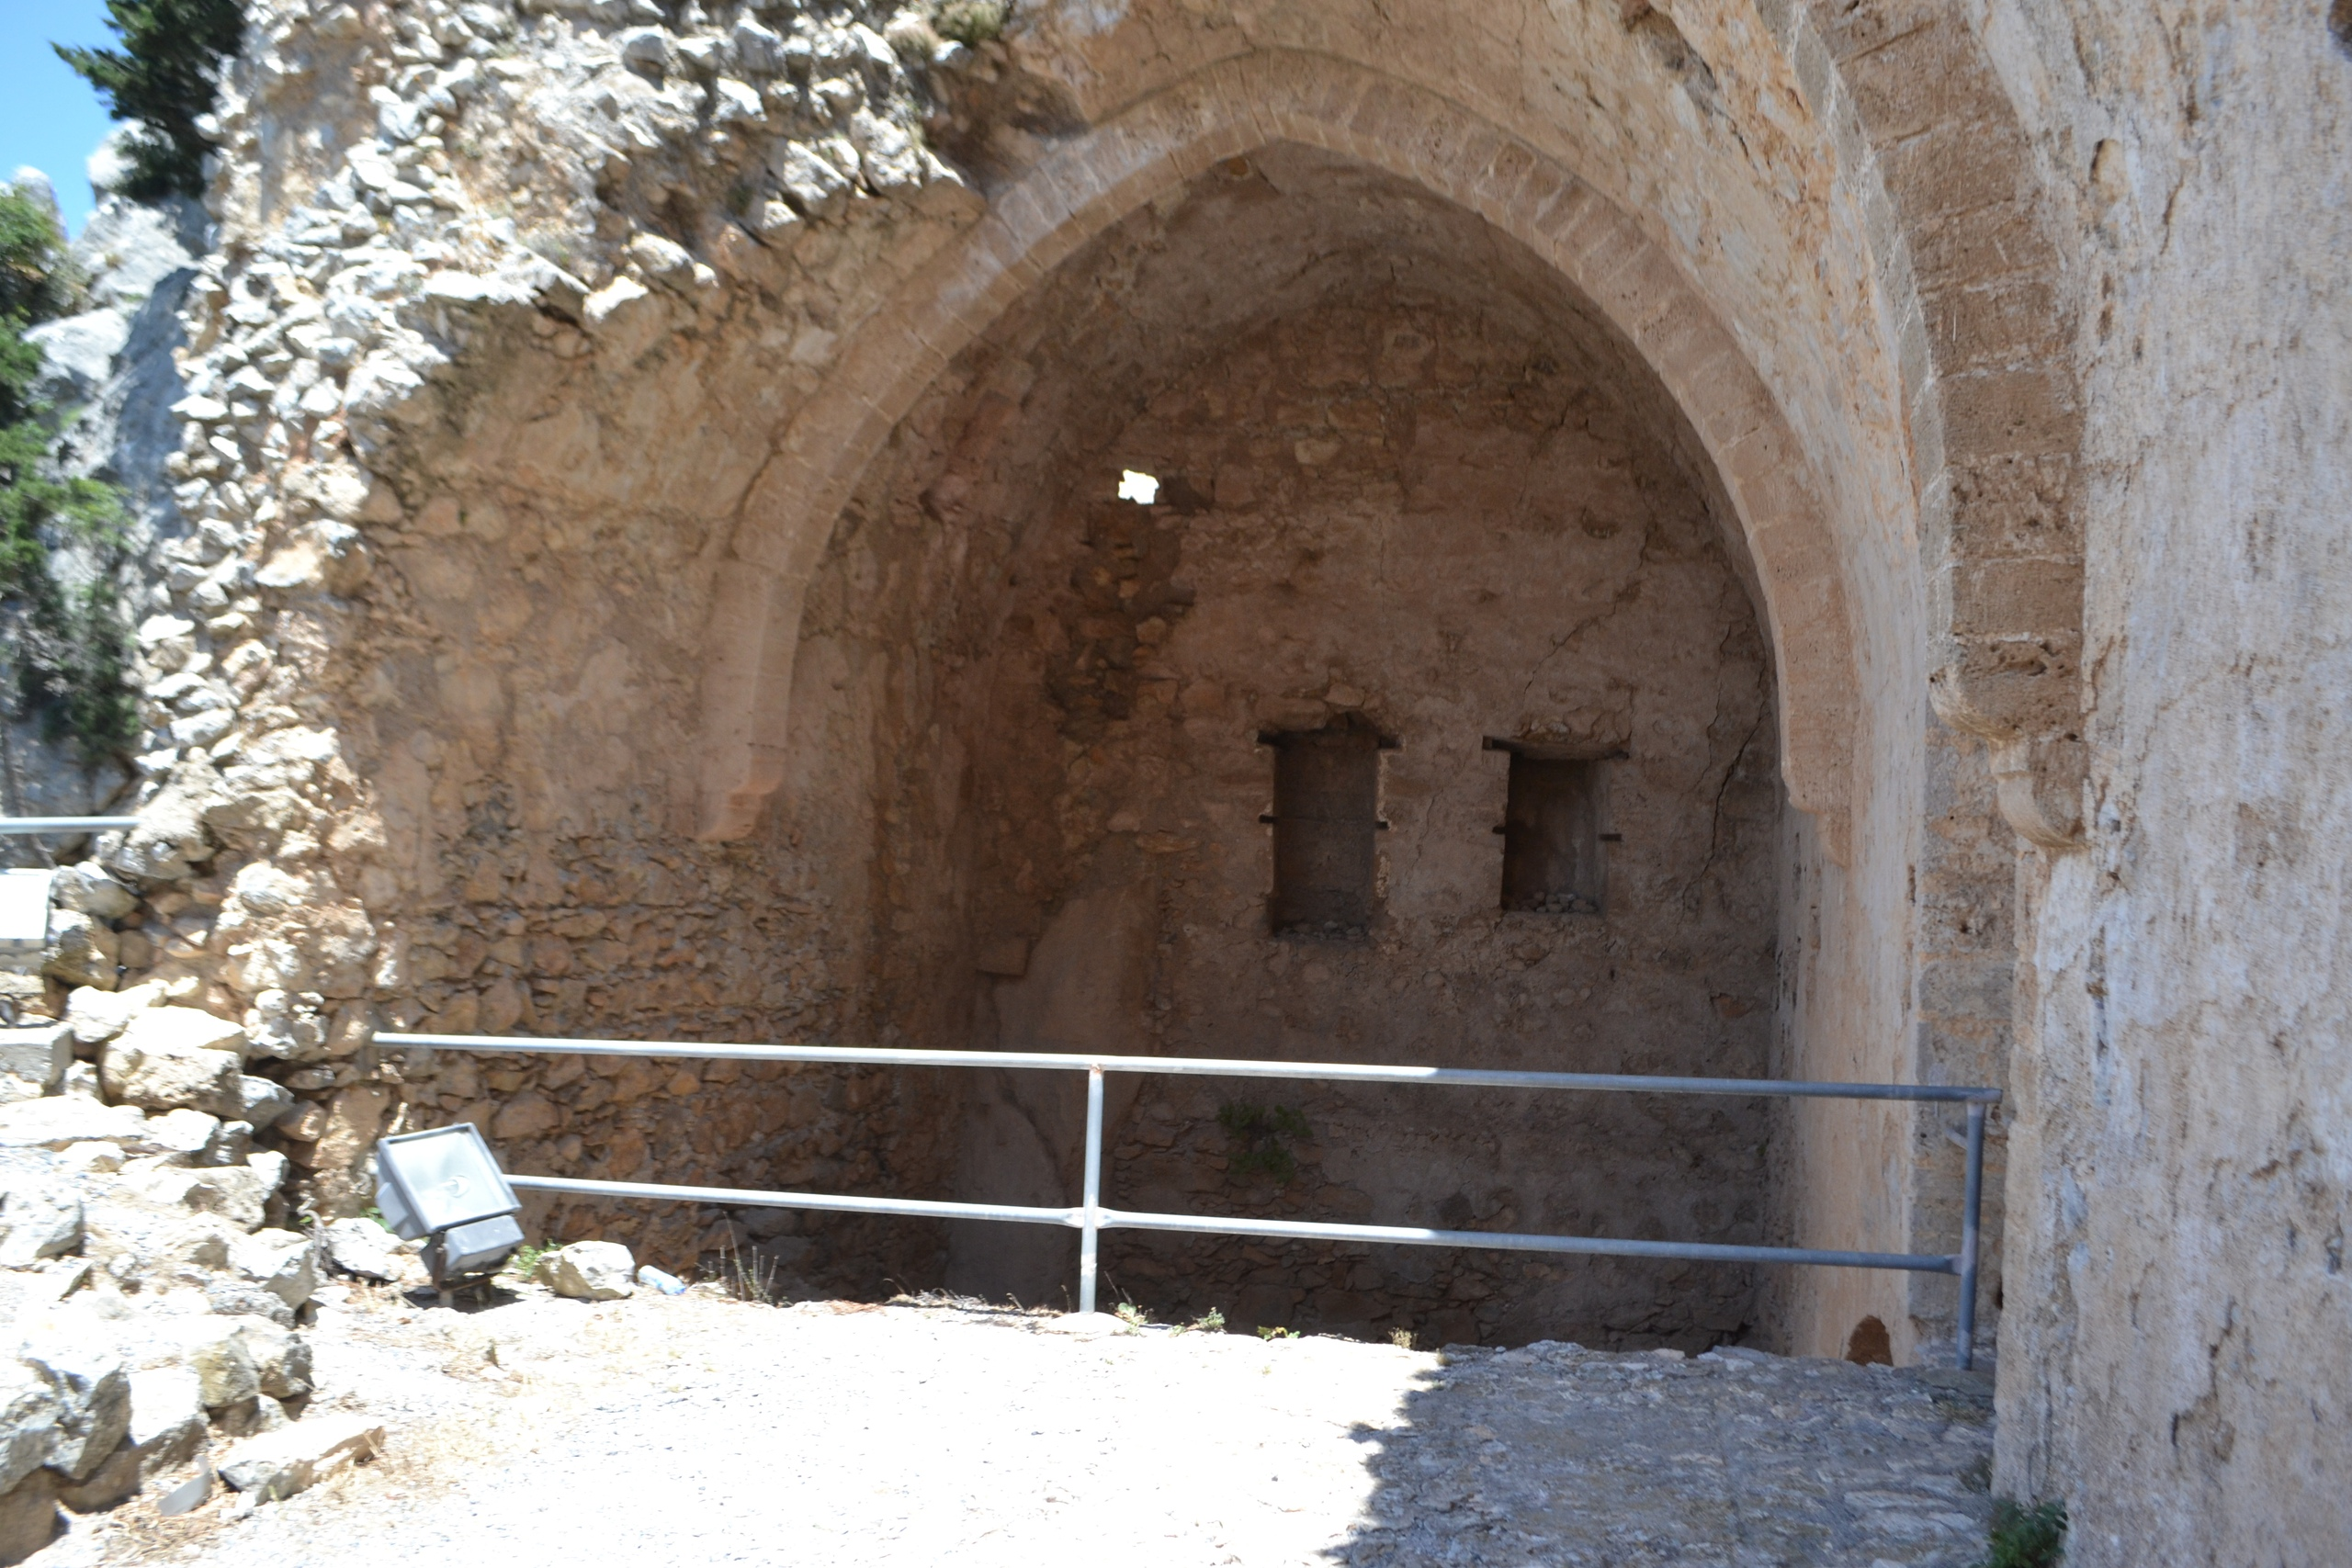 Северный Кипр. Замок Святого Иллариона. (фото). - Страница 3 ONpqimVkjuU